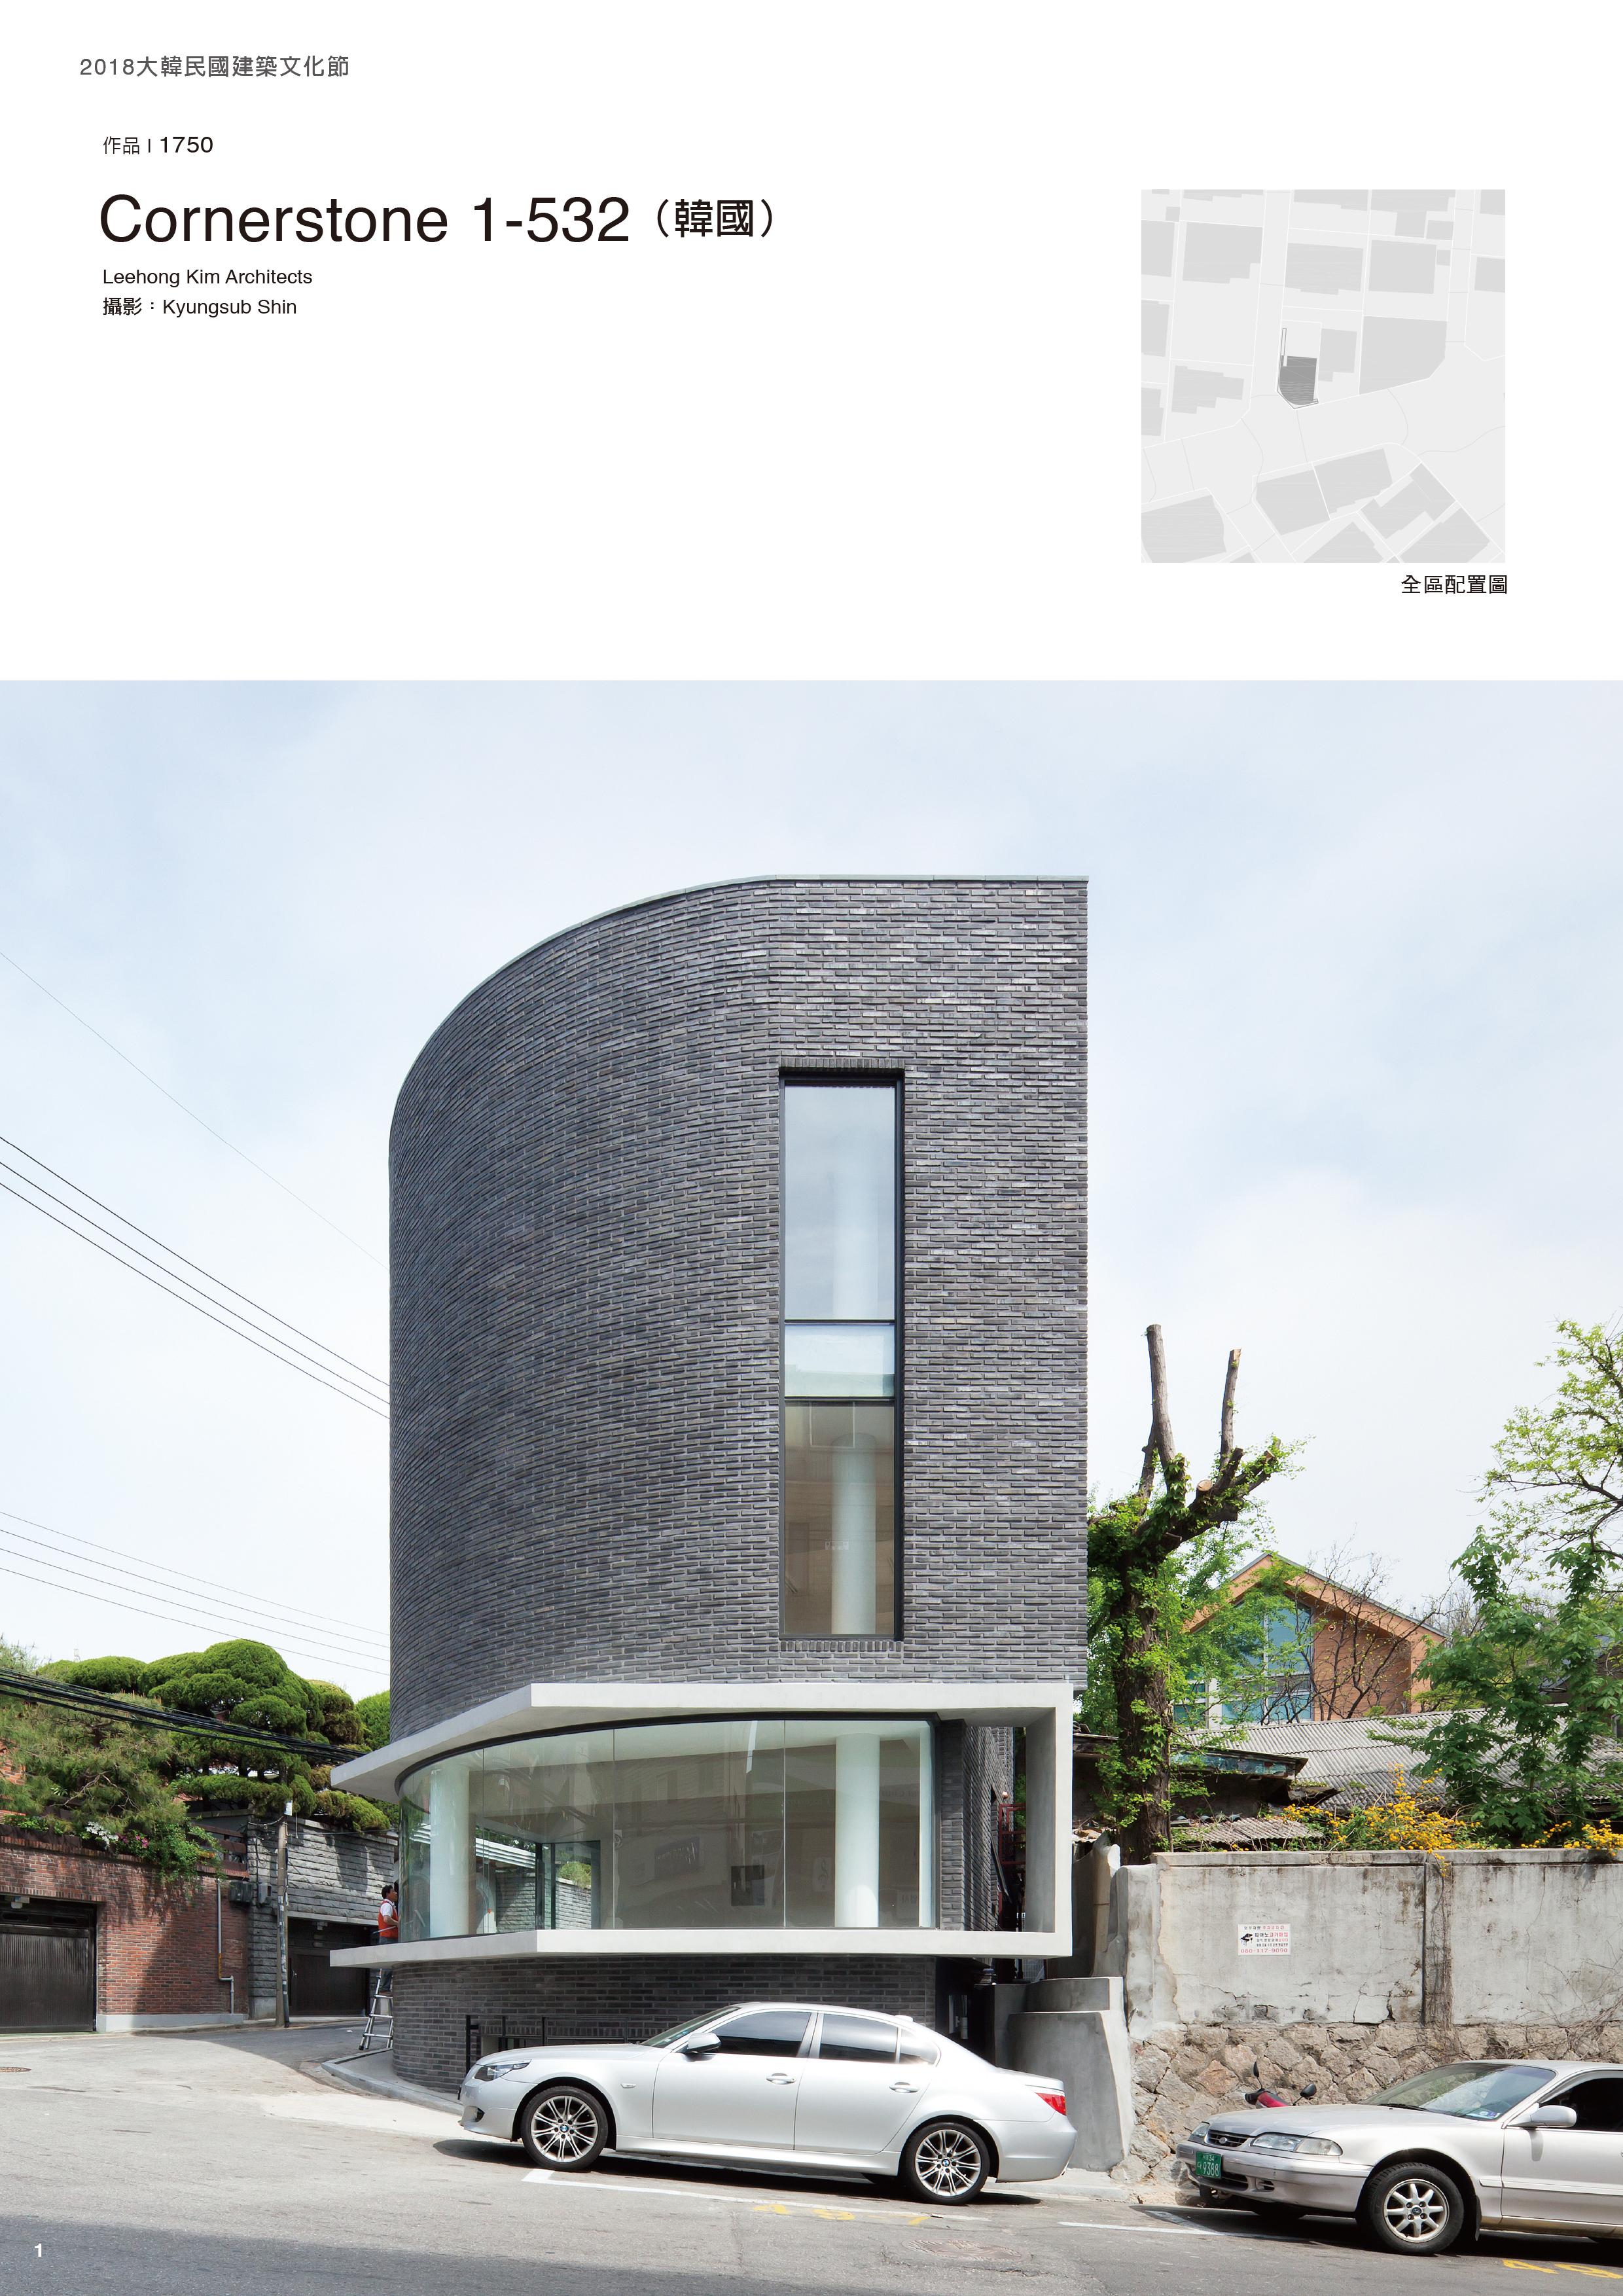 Taiwan Architecture Magazine (201801)_04_Cornerstone 1-532_page1.jpg